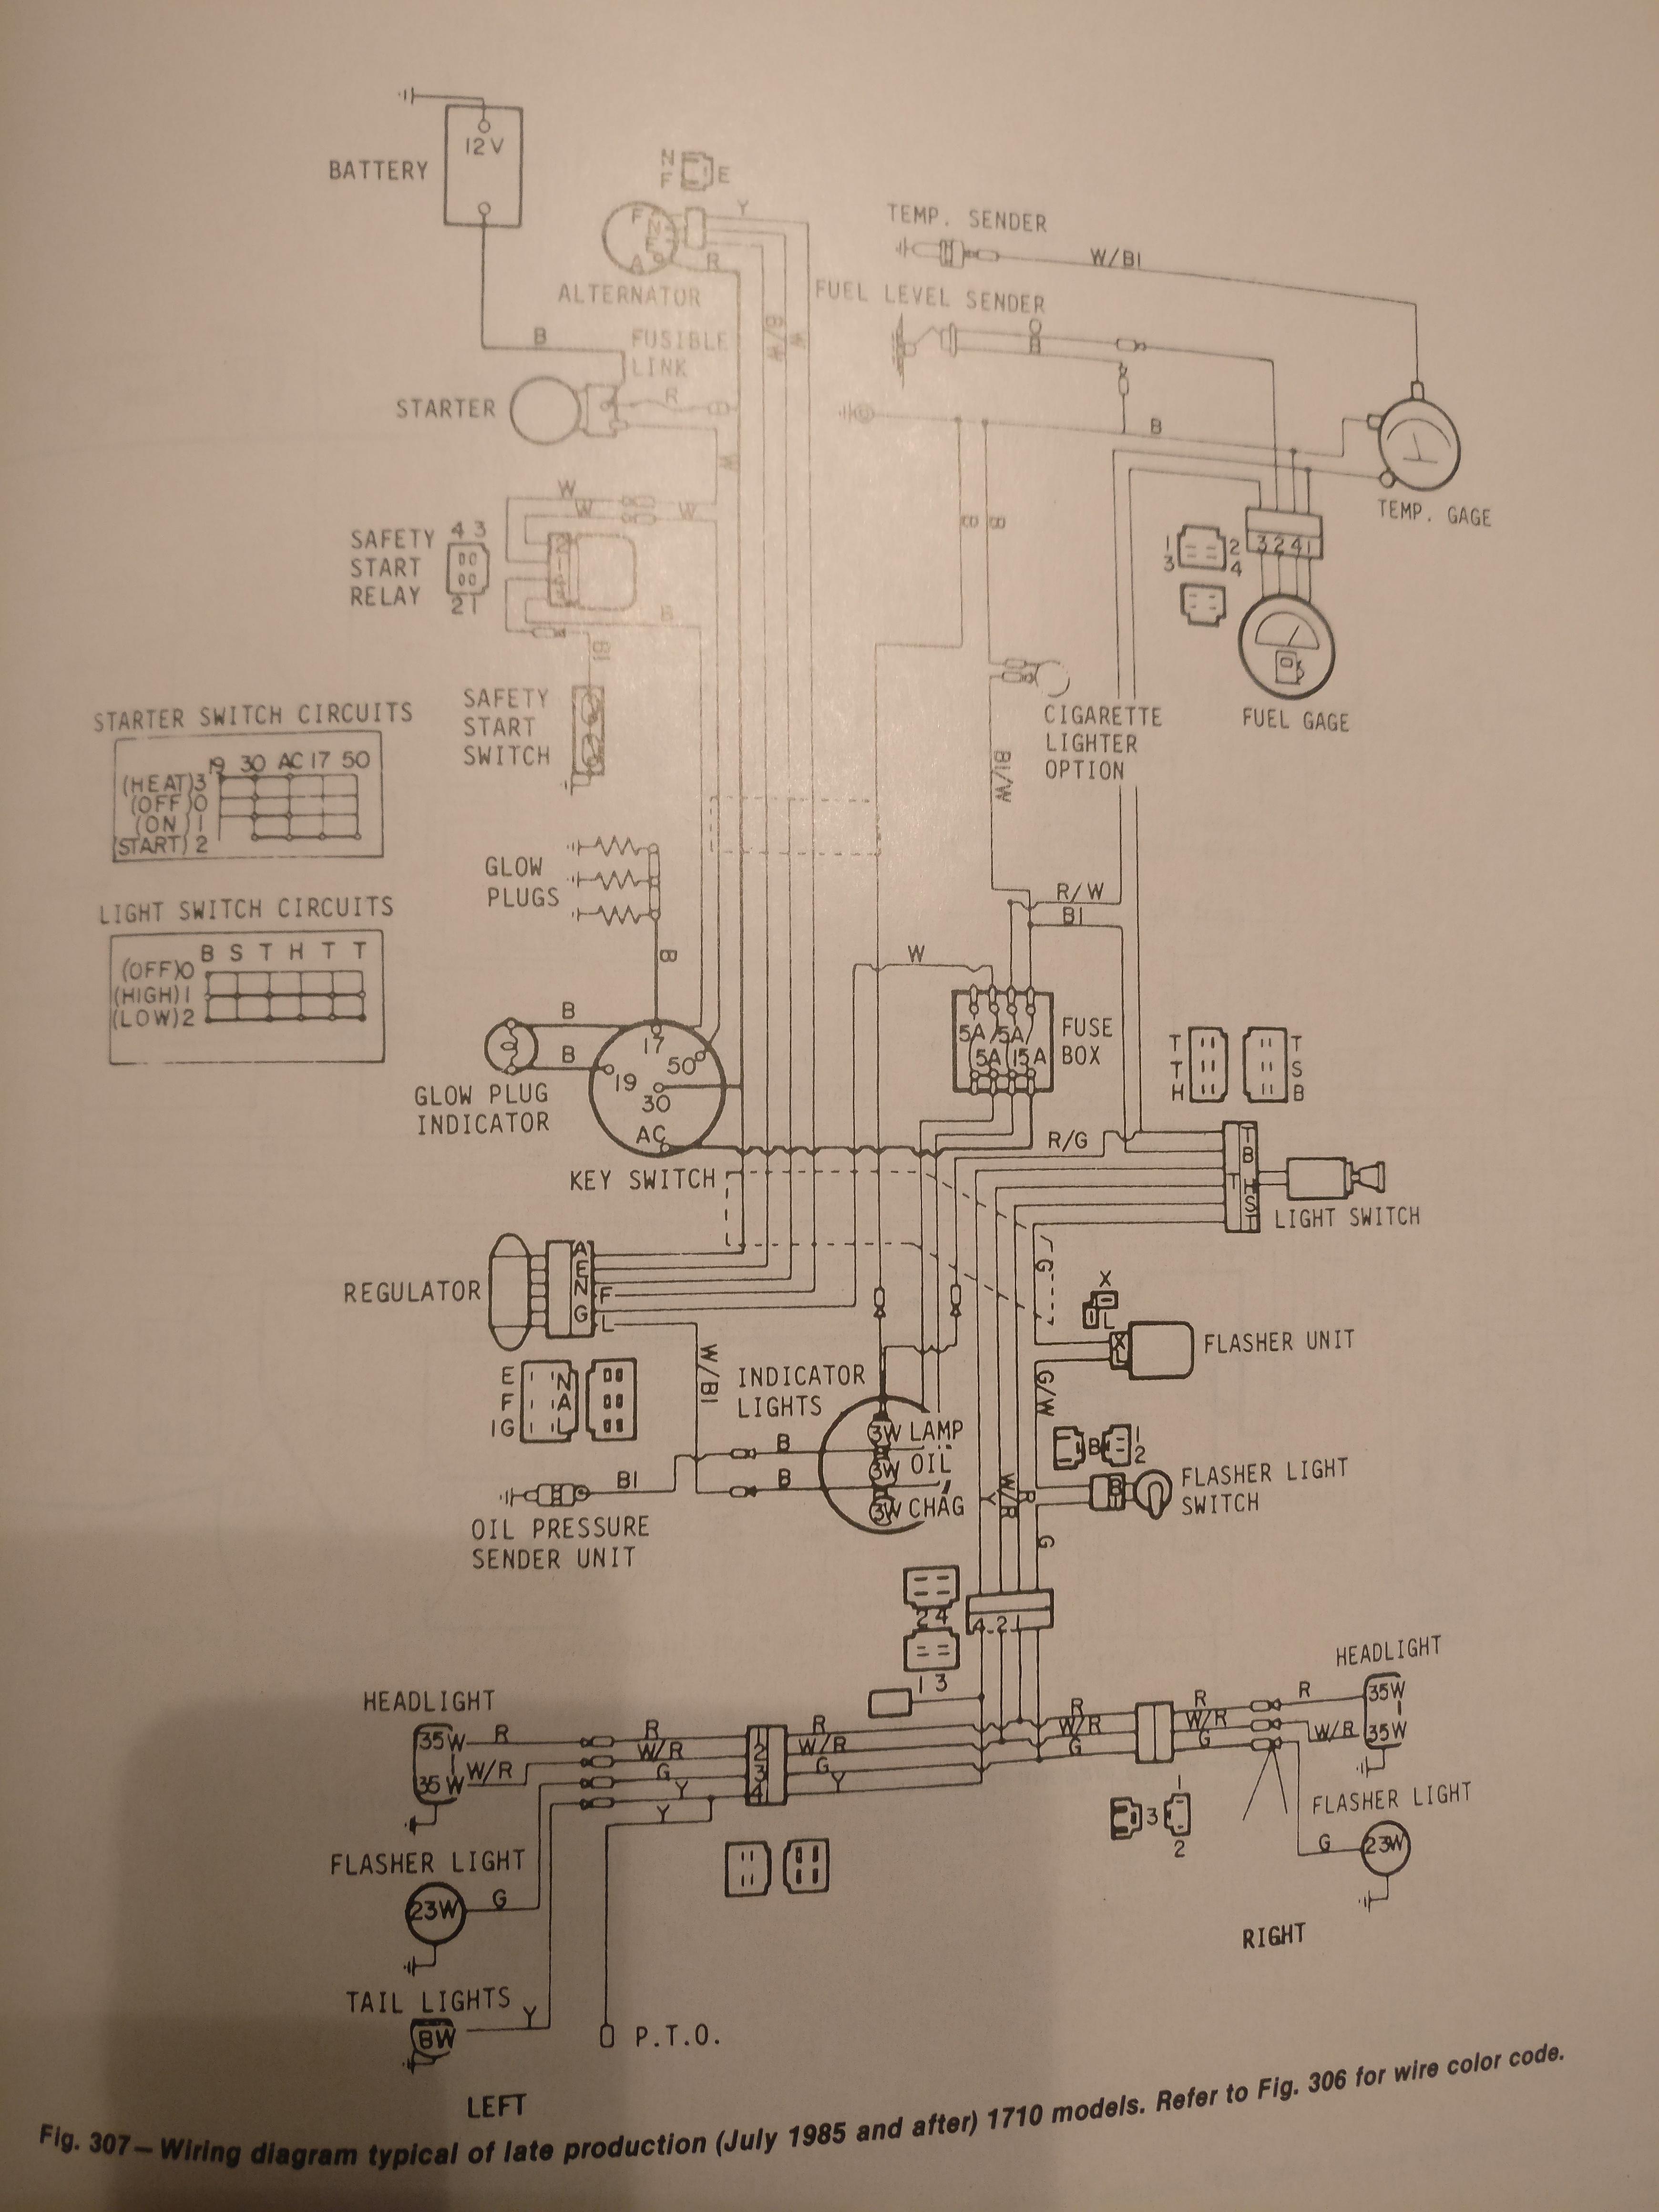 VD_4129] 86 Ford 1710 Tractor Alternator Wiring Diagram Download DiagramArcin Usnes Vira Mohammedshrine Librar Wiring 101